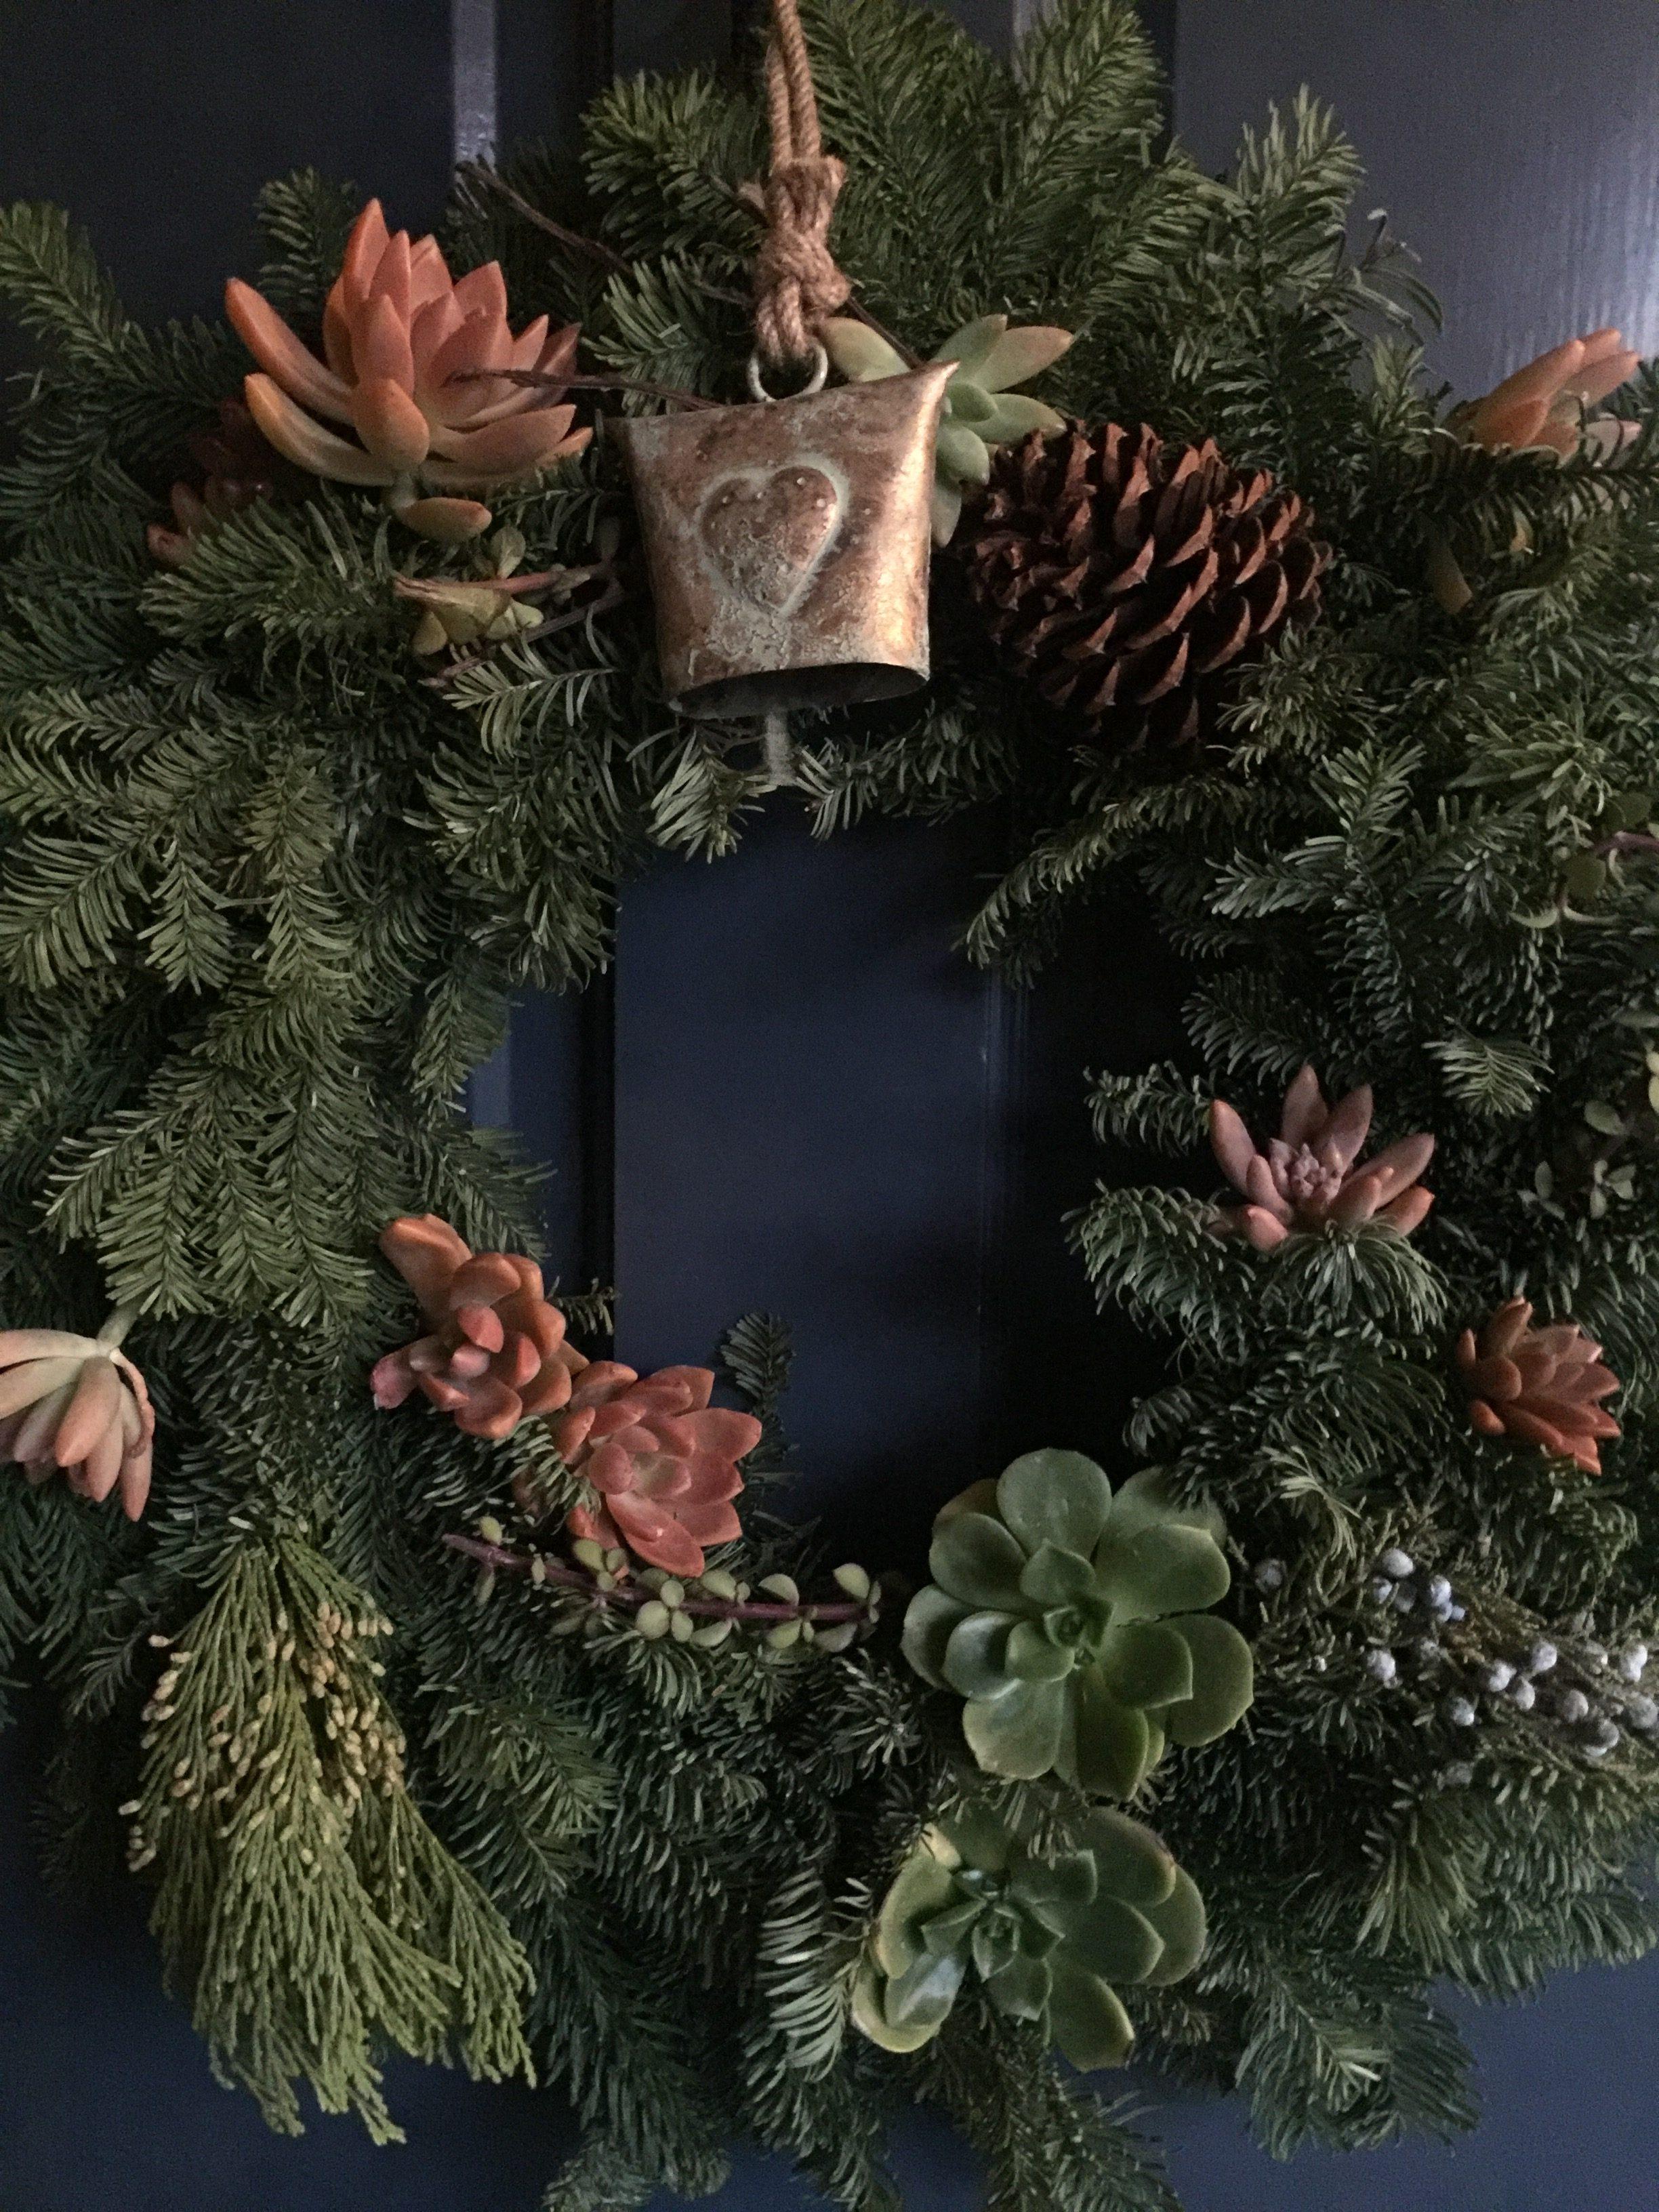 Savoring the Little Joys of Christmas